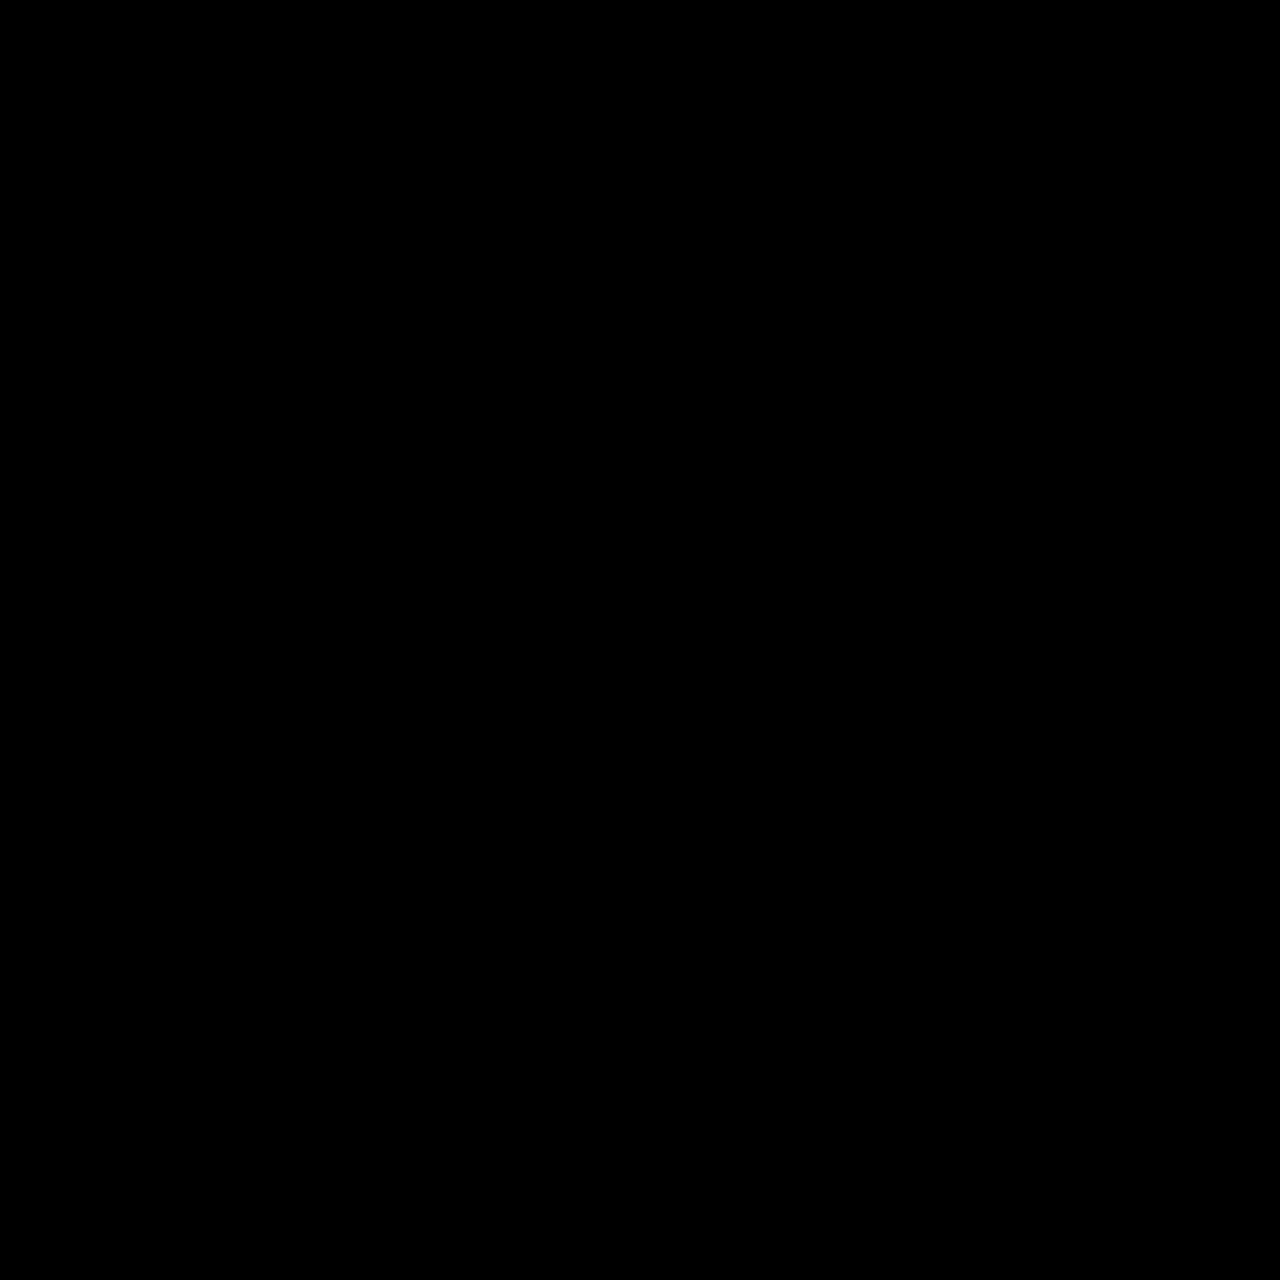 silhouette-1314467_1280